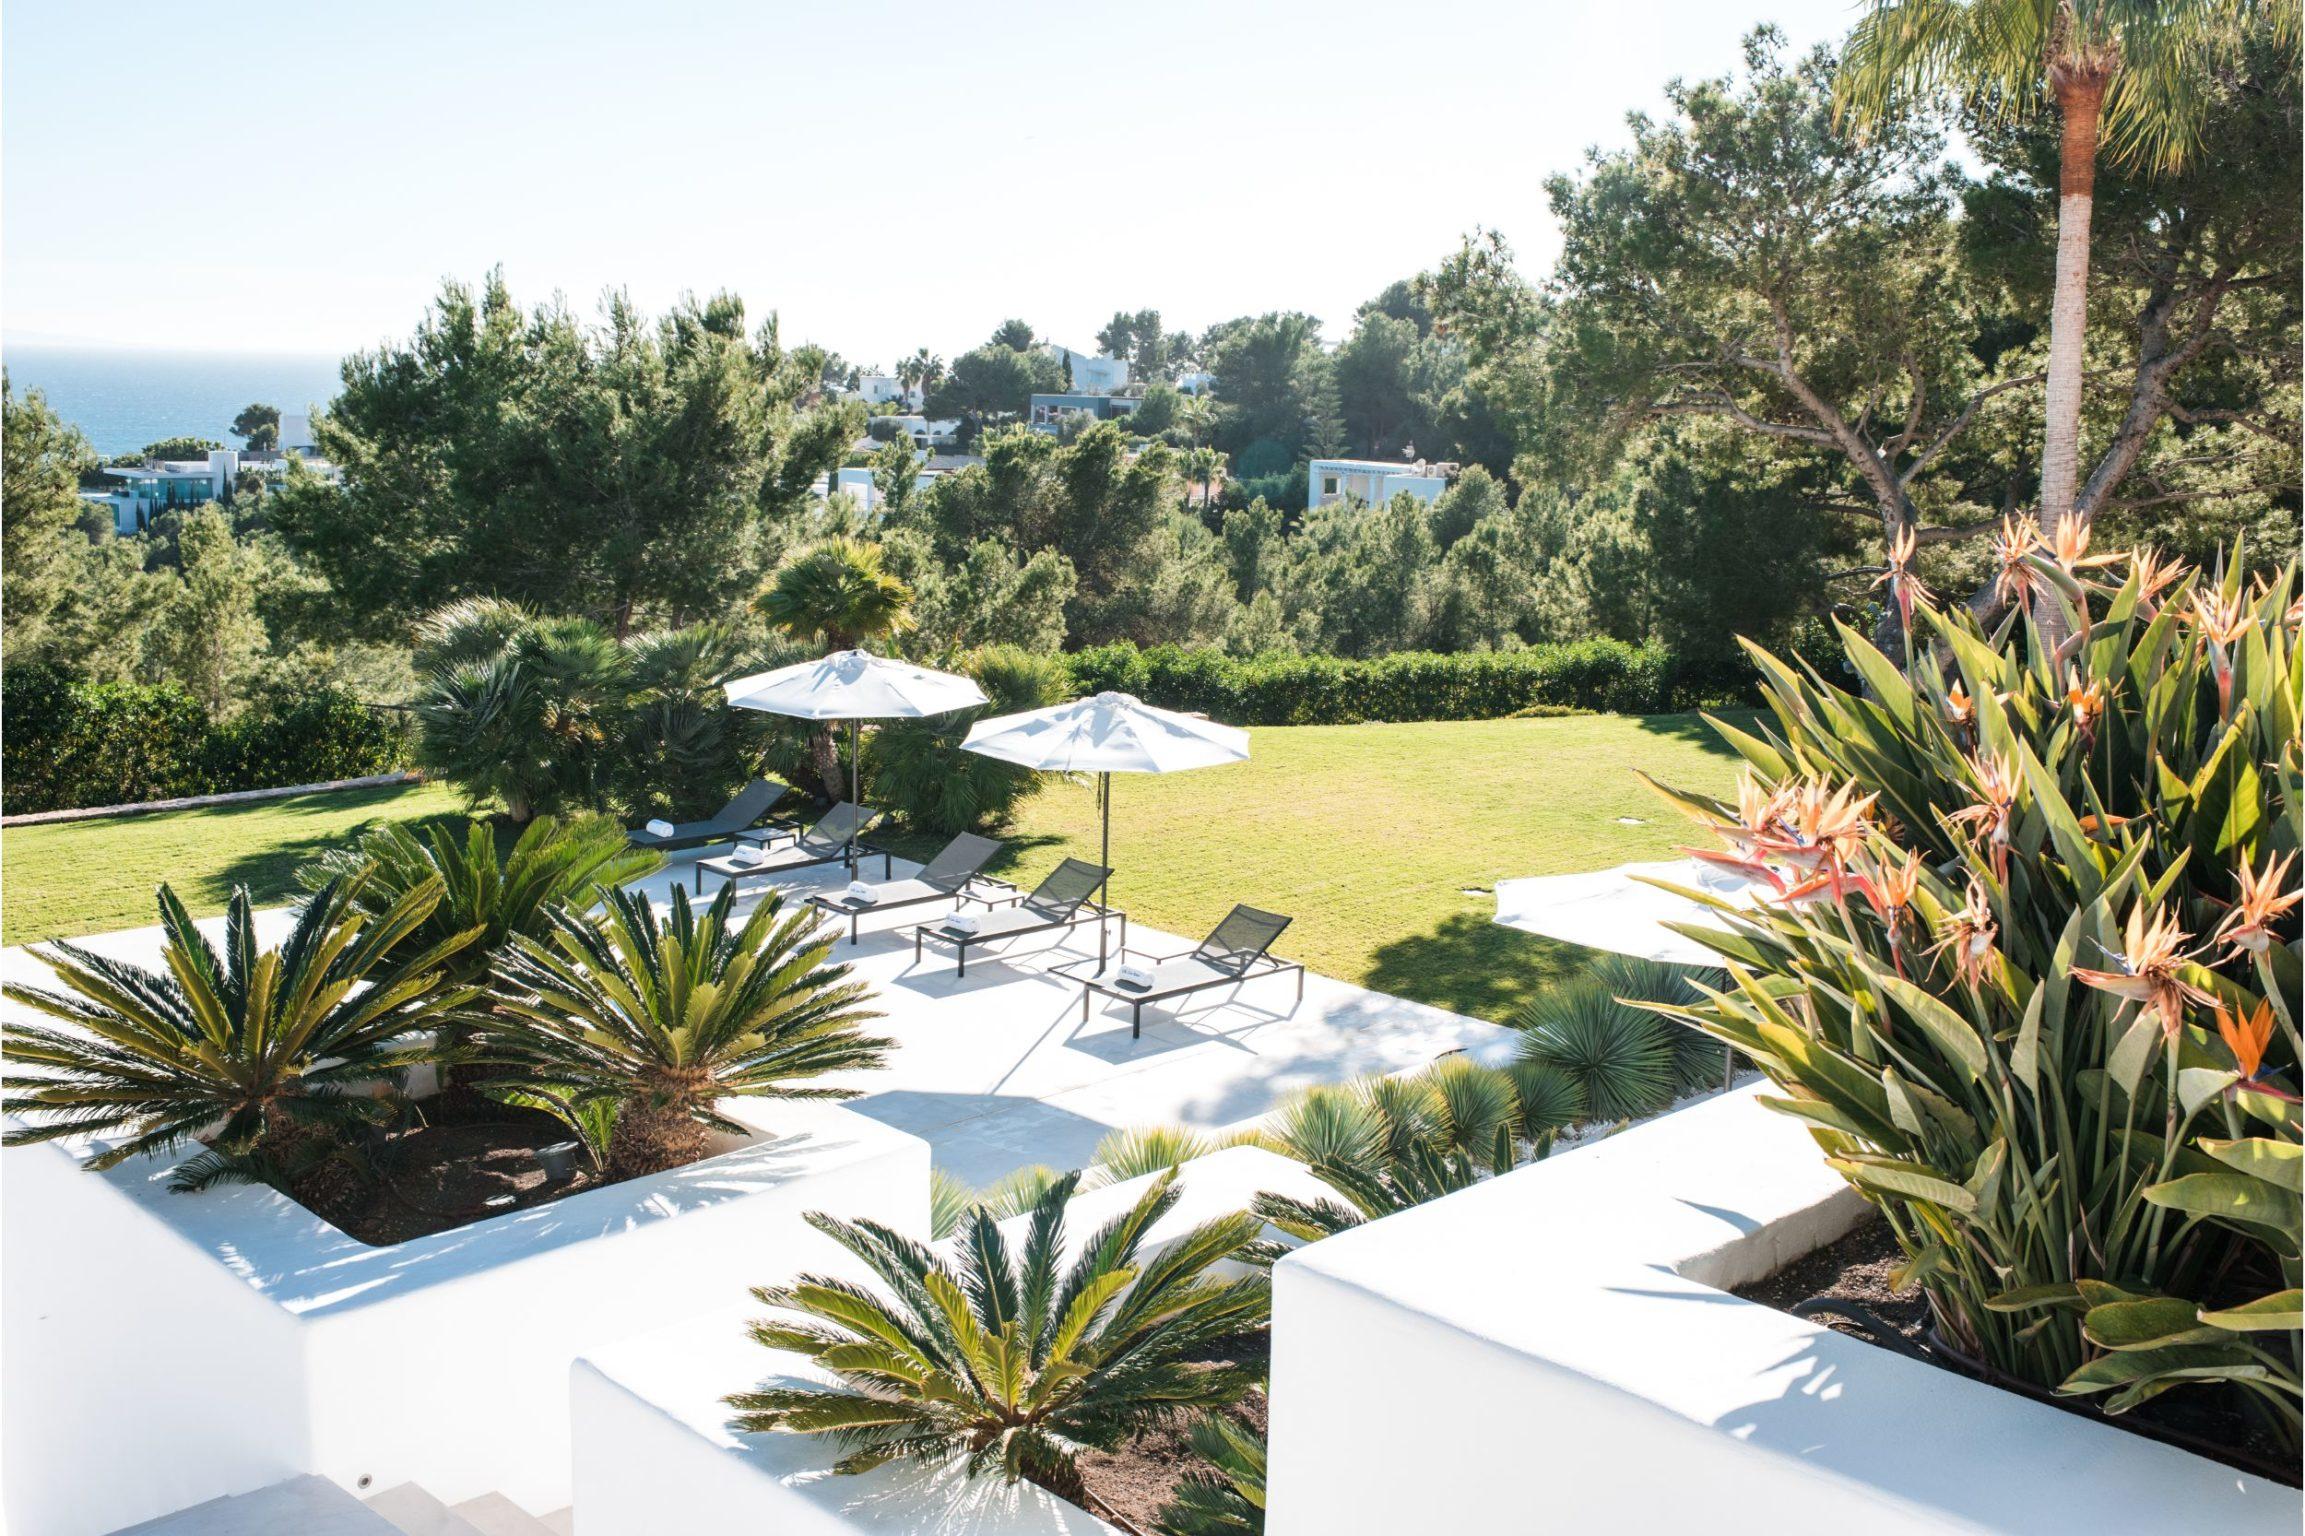 https://www.white-ibiza.com/wp-content/uploads/2020/02/white-ibiza-villas-cap-alvero-outdoors-1-2305x1536.jpg